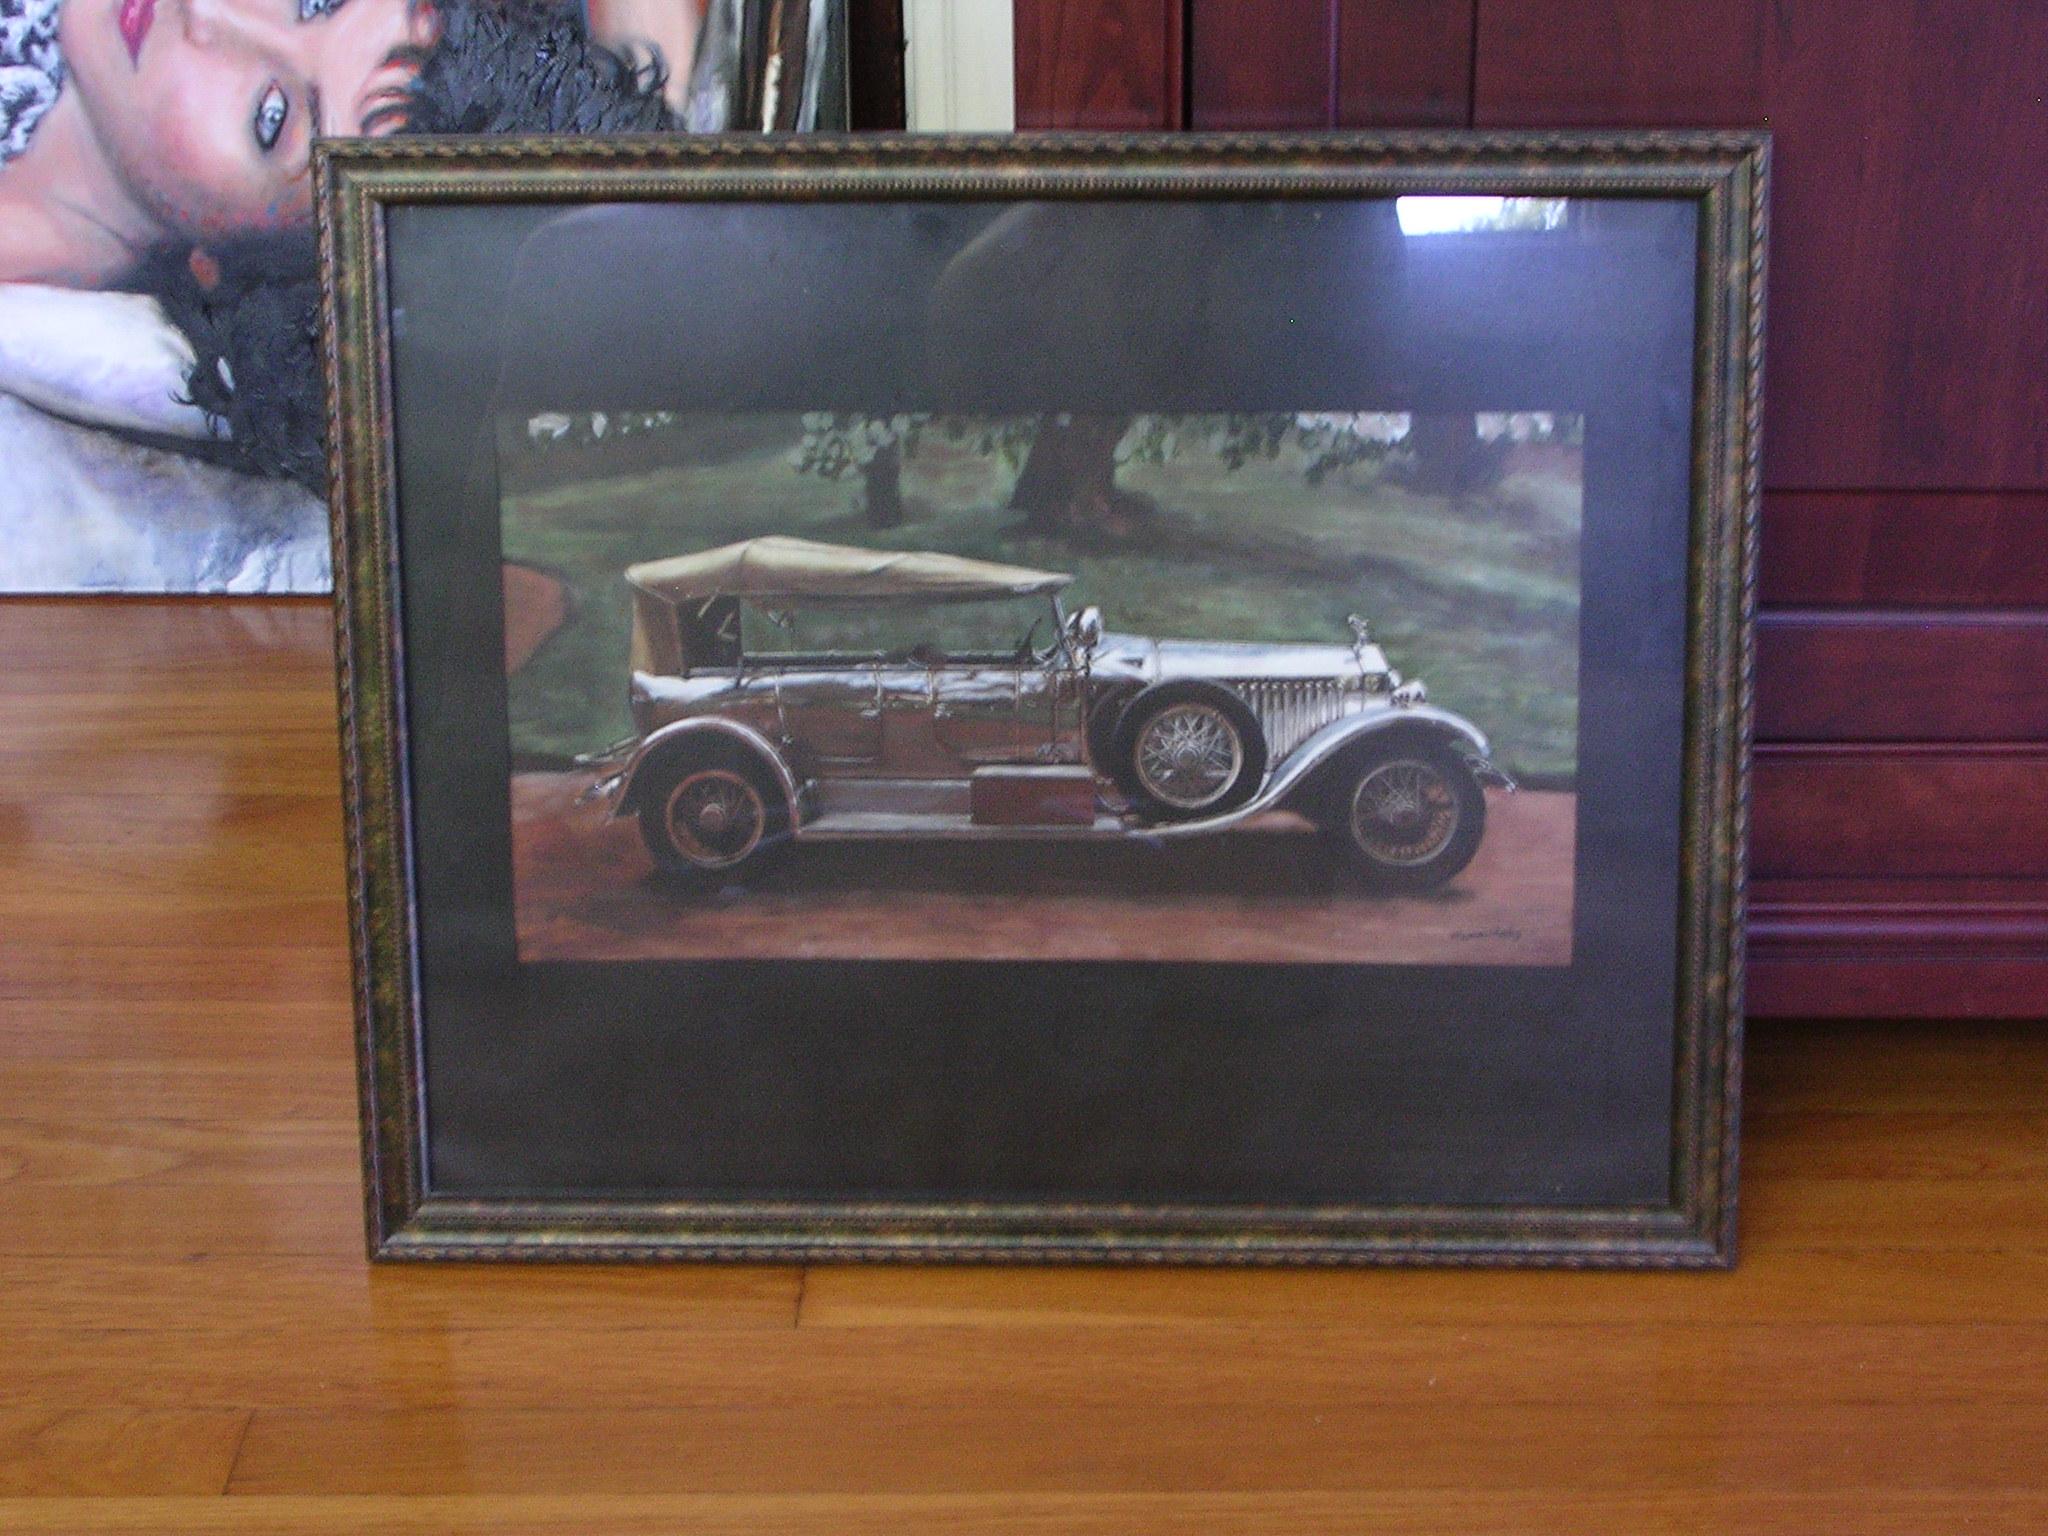 Antique Rolls Royce.JPG